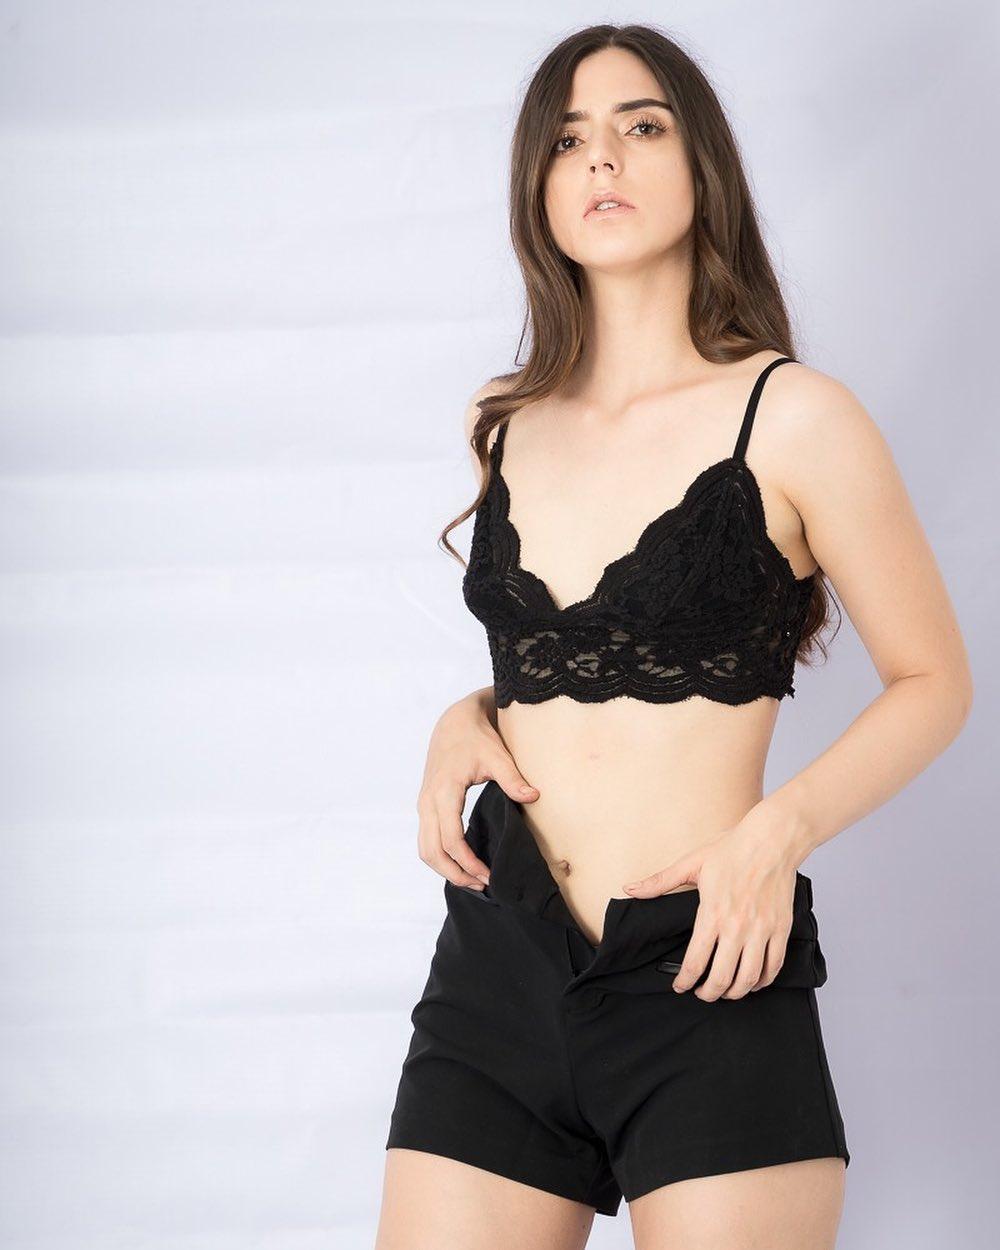 Entrevista modelo Mariel Escalera